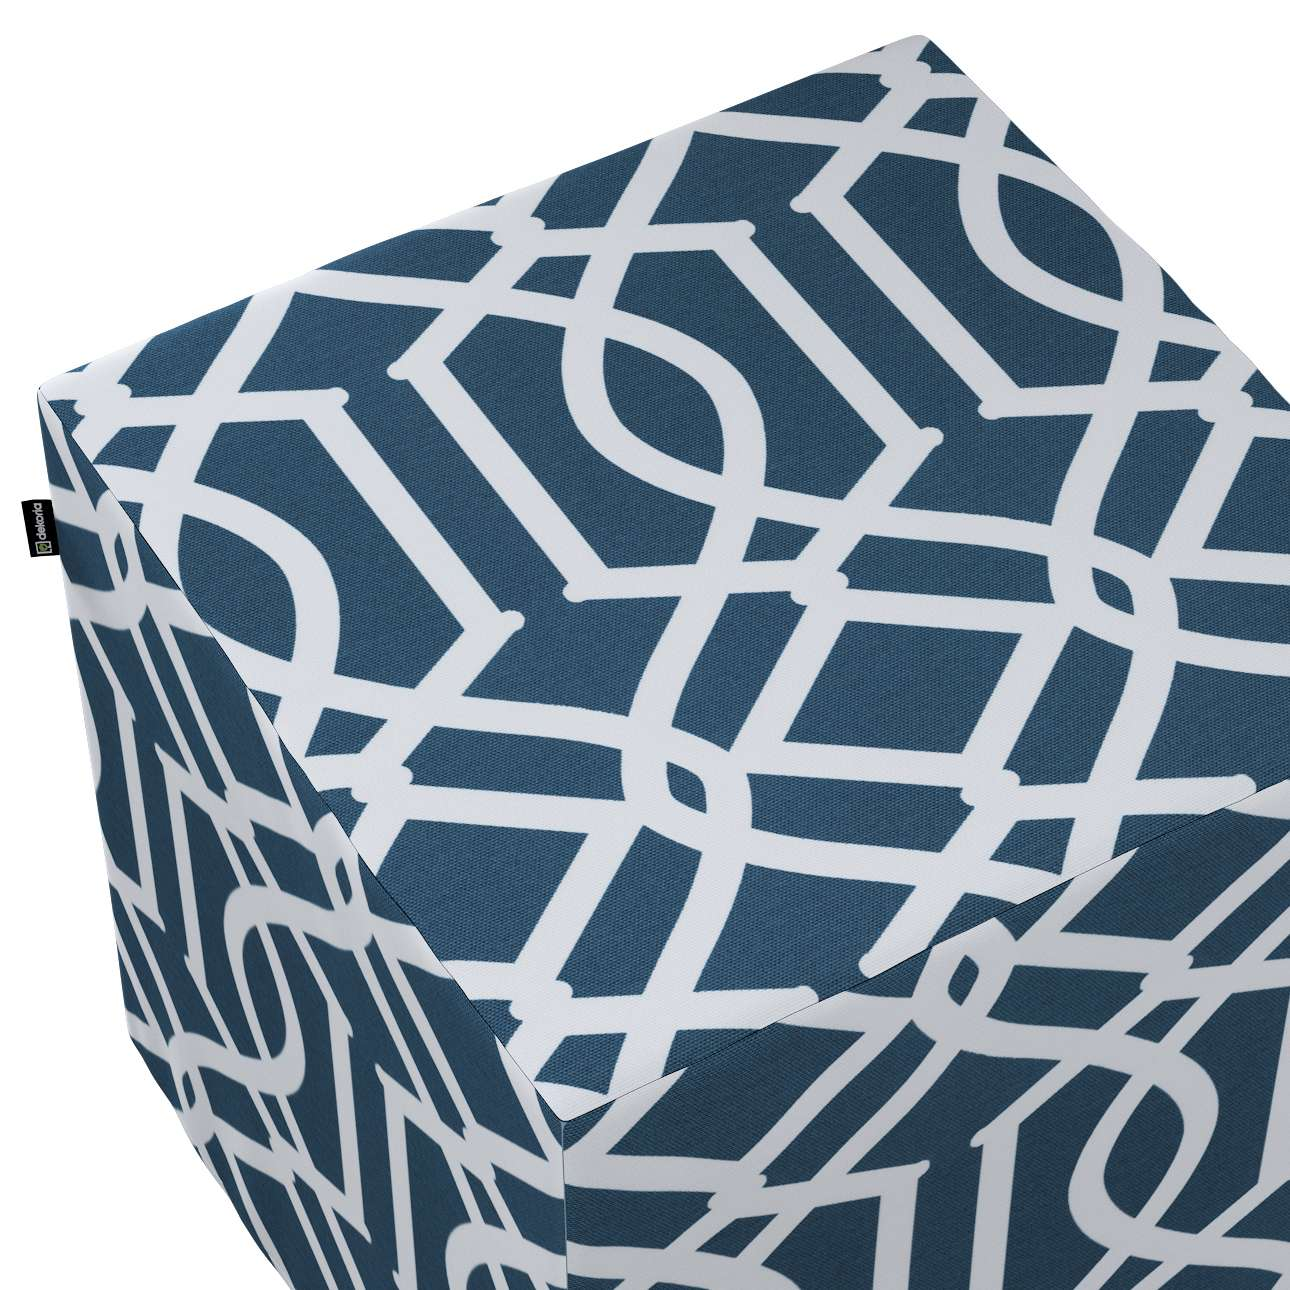 Sedák Cube - kostka pevná 40x40x40 v kolekci Comics, látka: 135-10